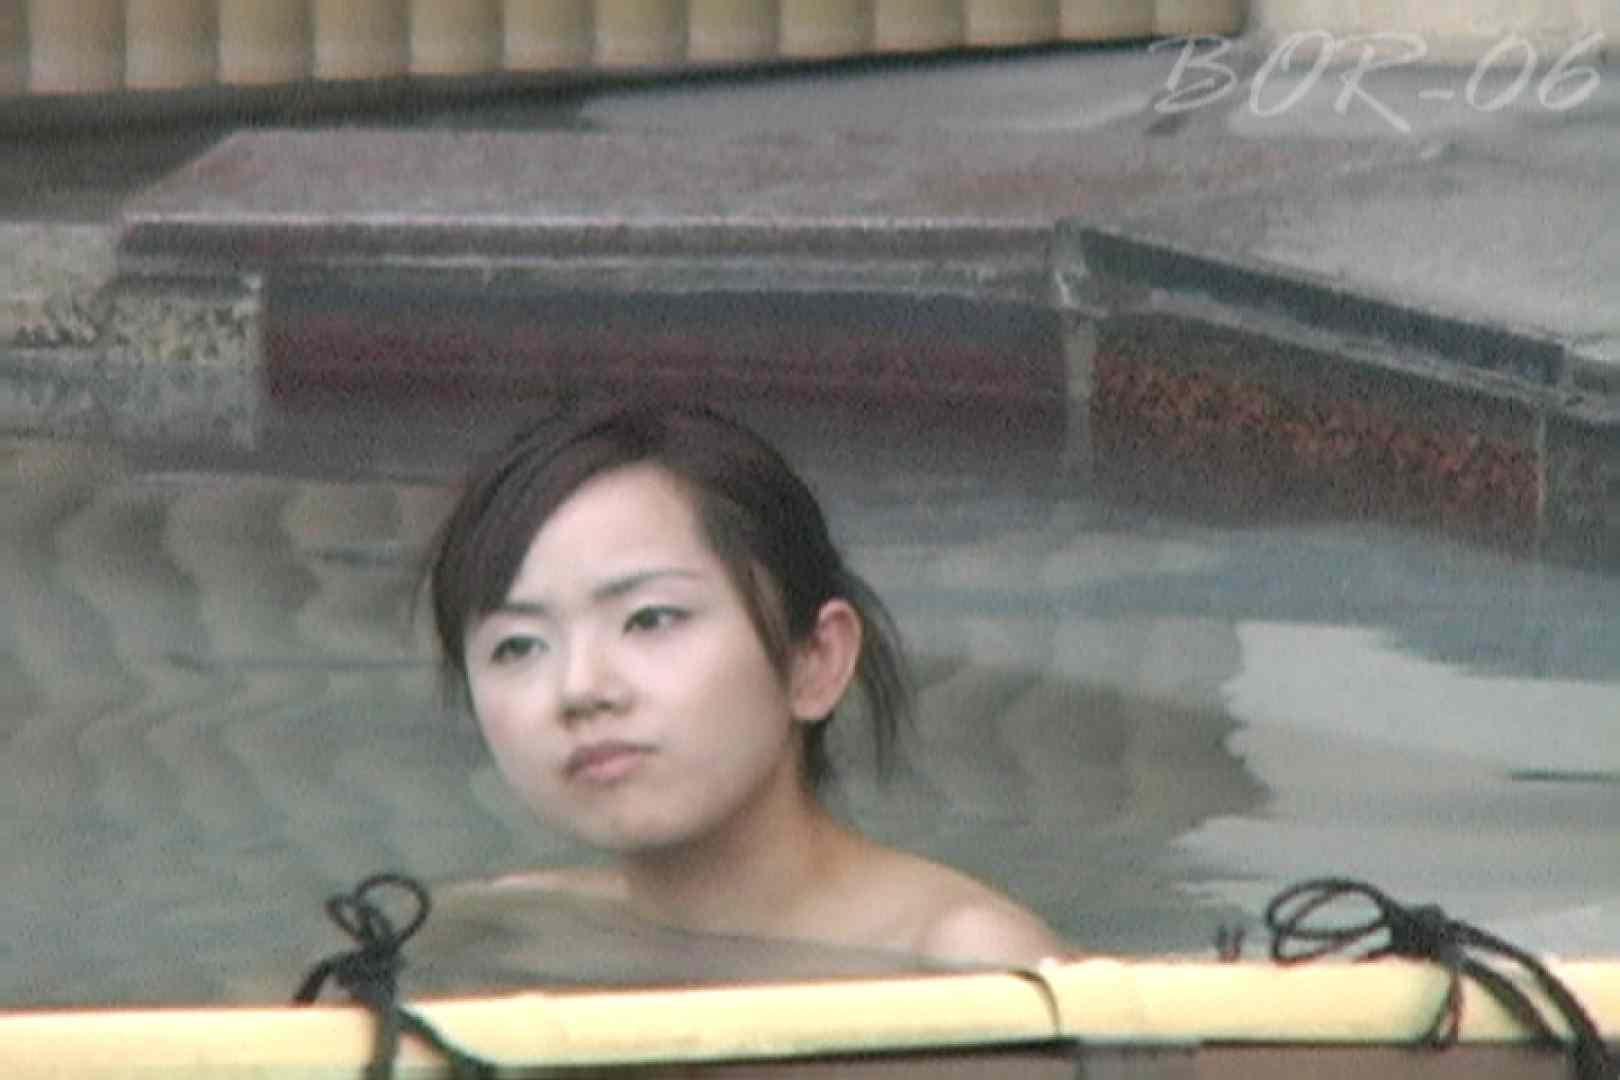 Aquaな露天風呂Vol.521 OLセックス  92画像 39